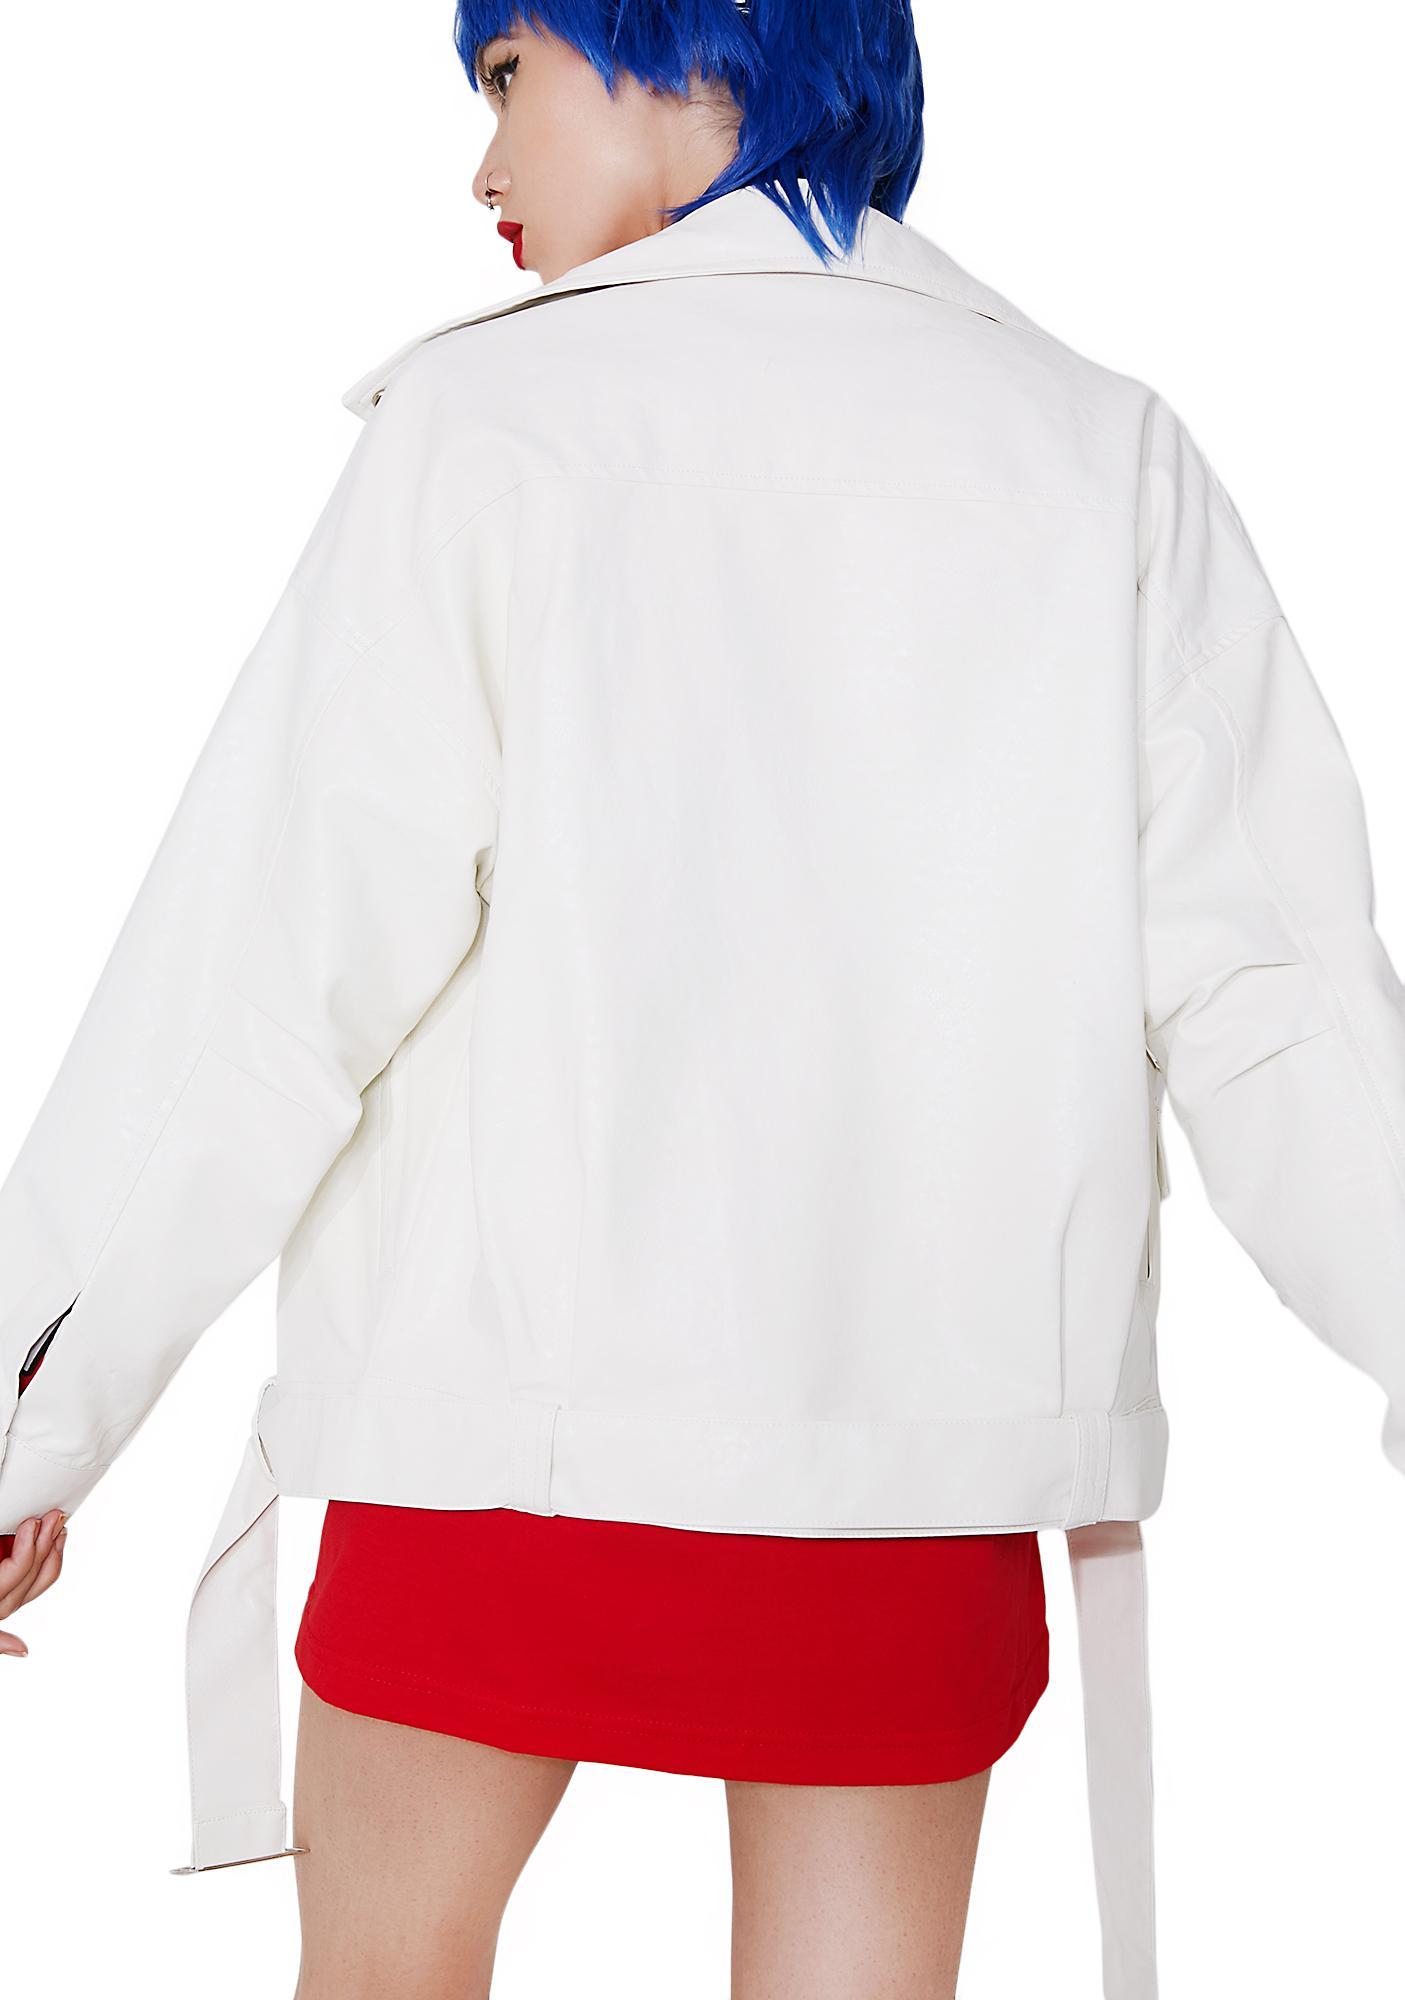 Viva Las Vegas Slouchy Moto Jacket